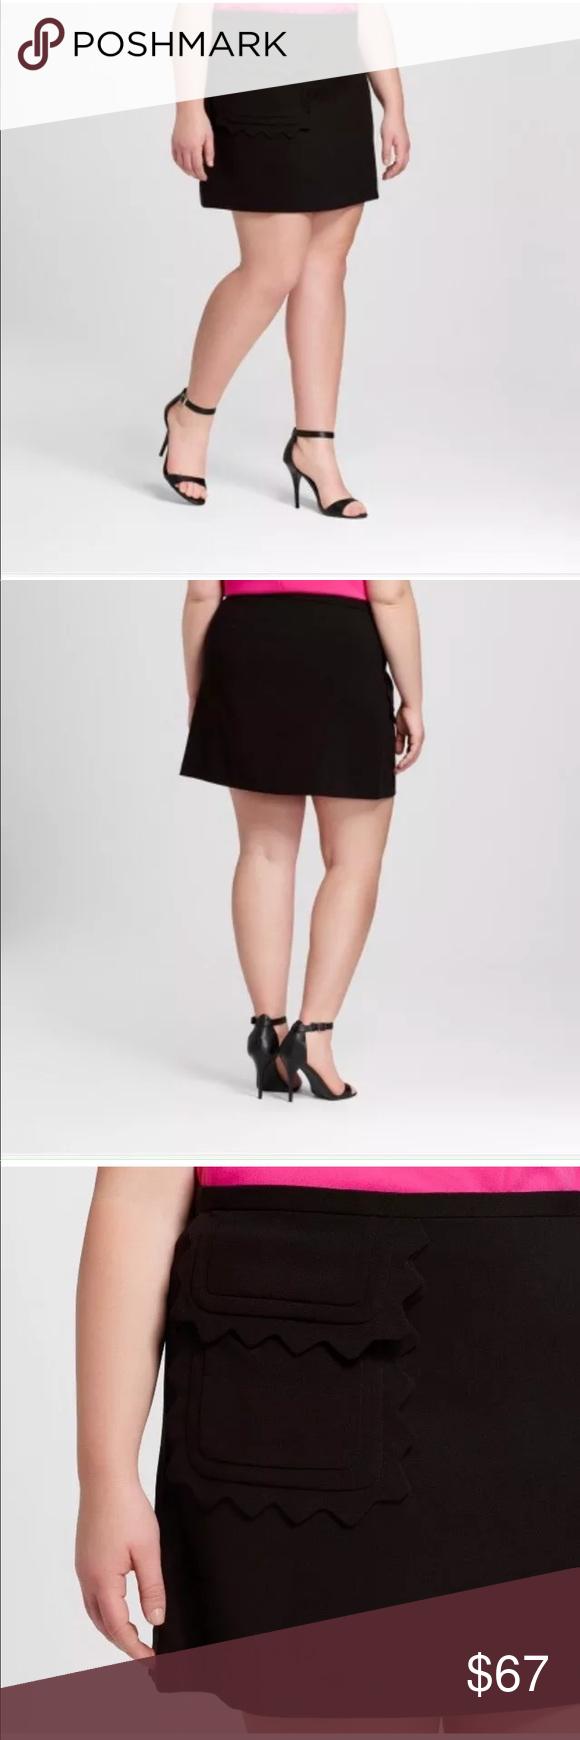 a61c5e3d1c Victoria Beckham Target 2X Twill Skirt Scallop Victoria Beckham Target 2X  Black Twill Skirt Plus Size